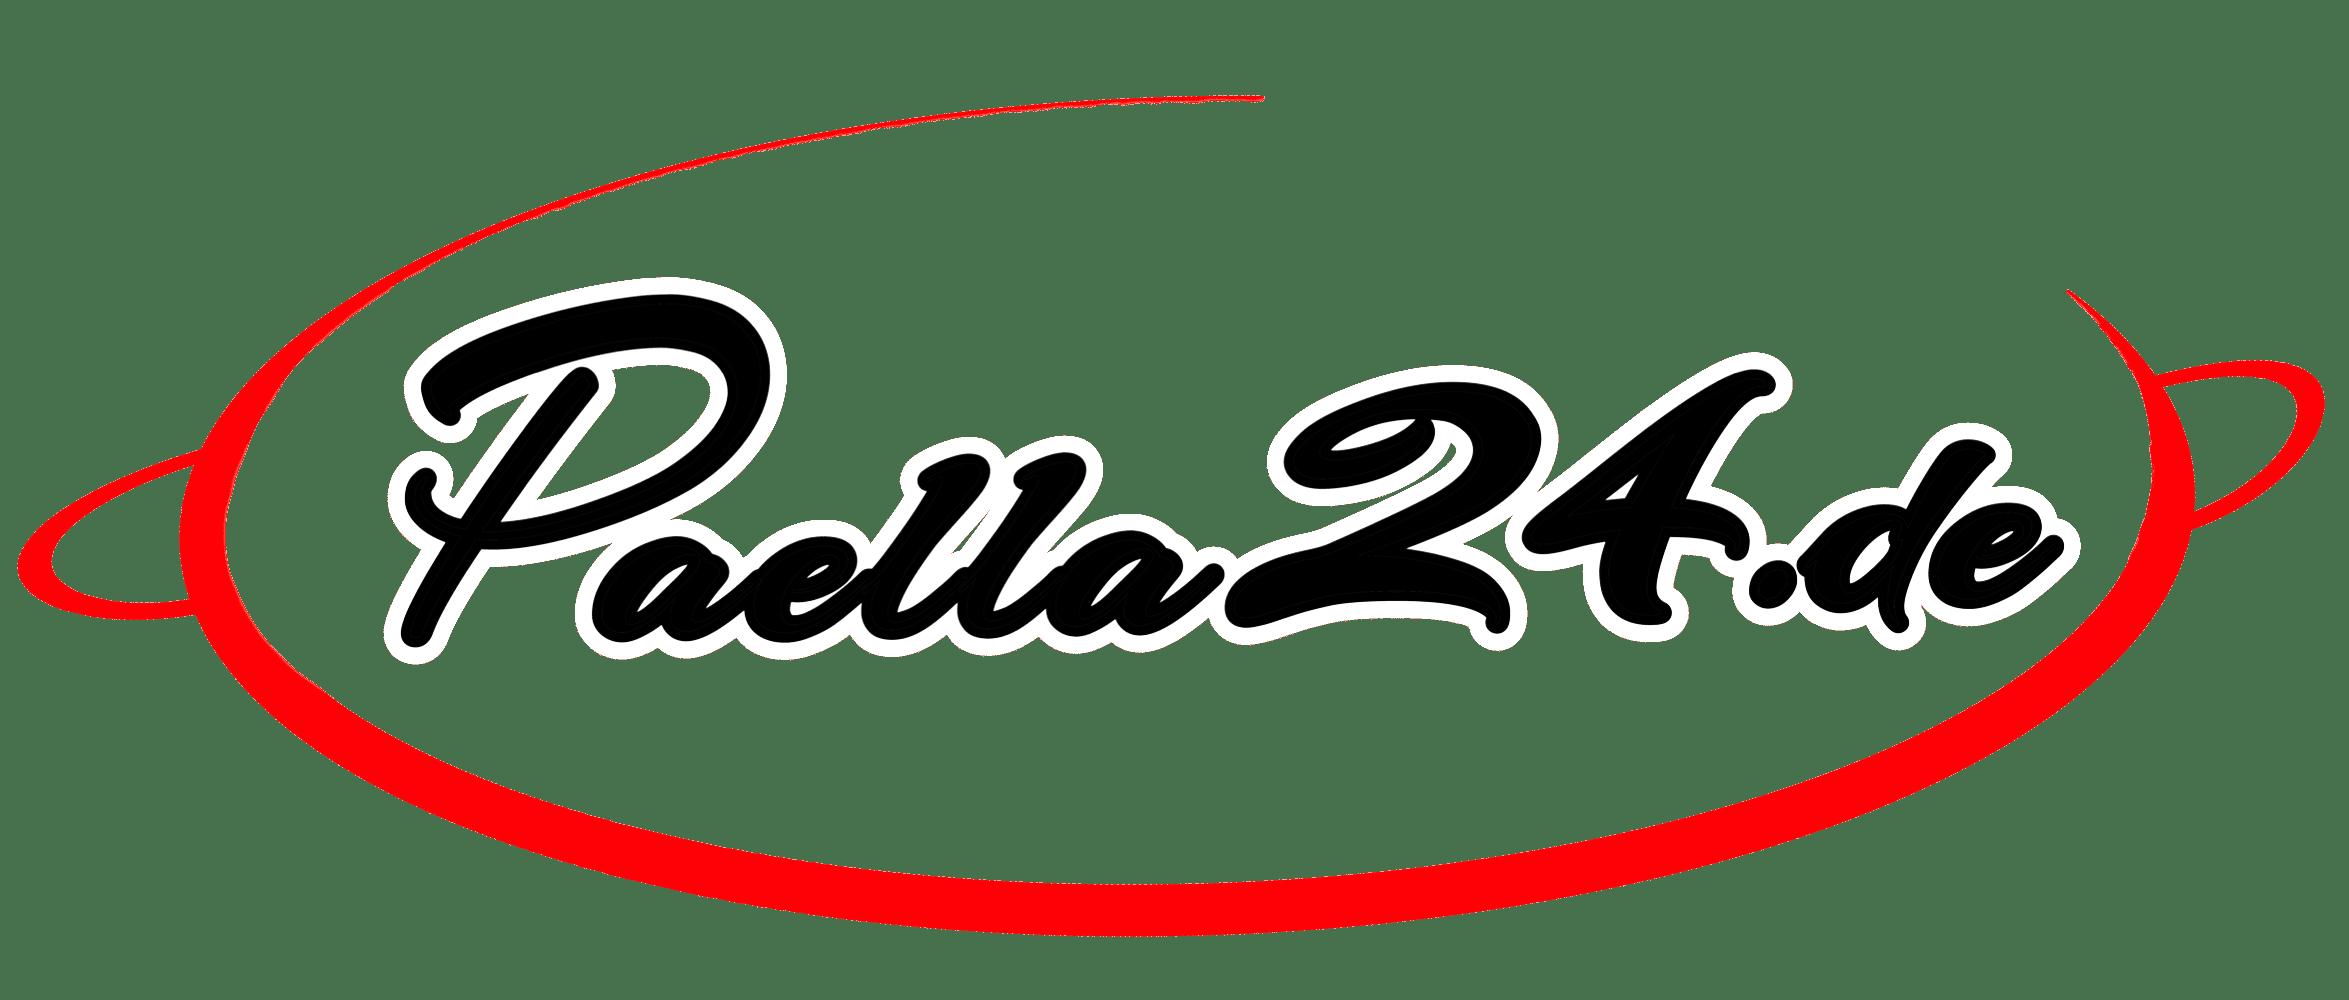 Catering Paella 24